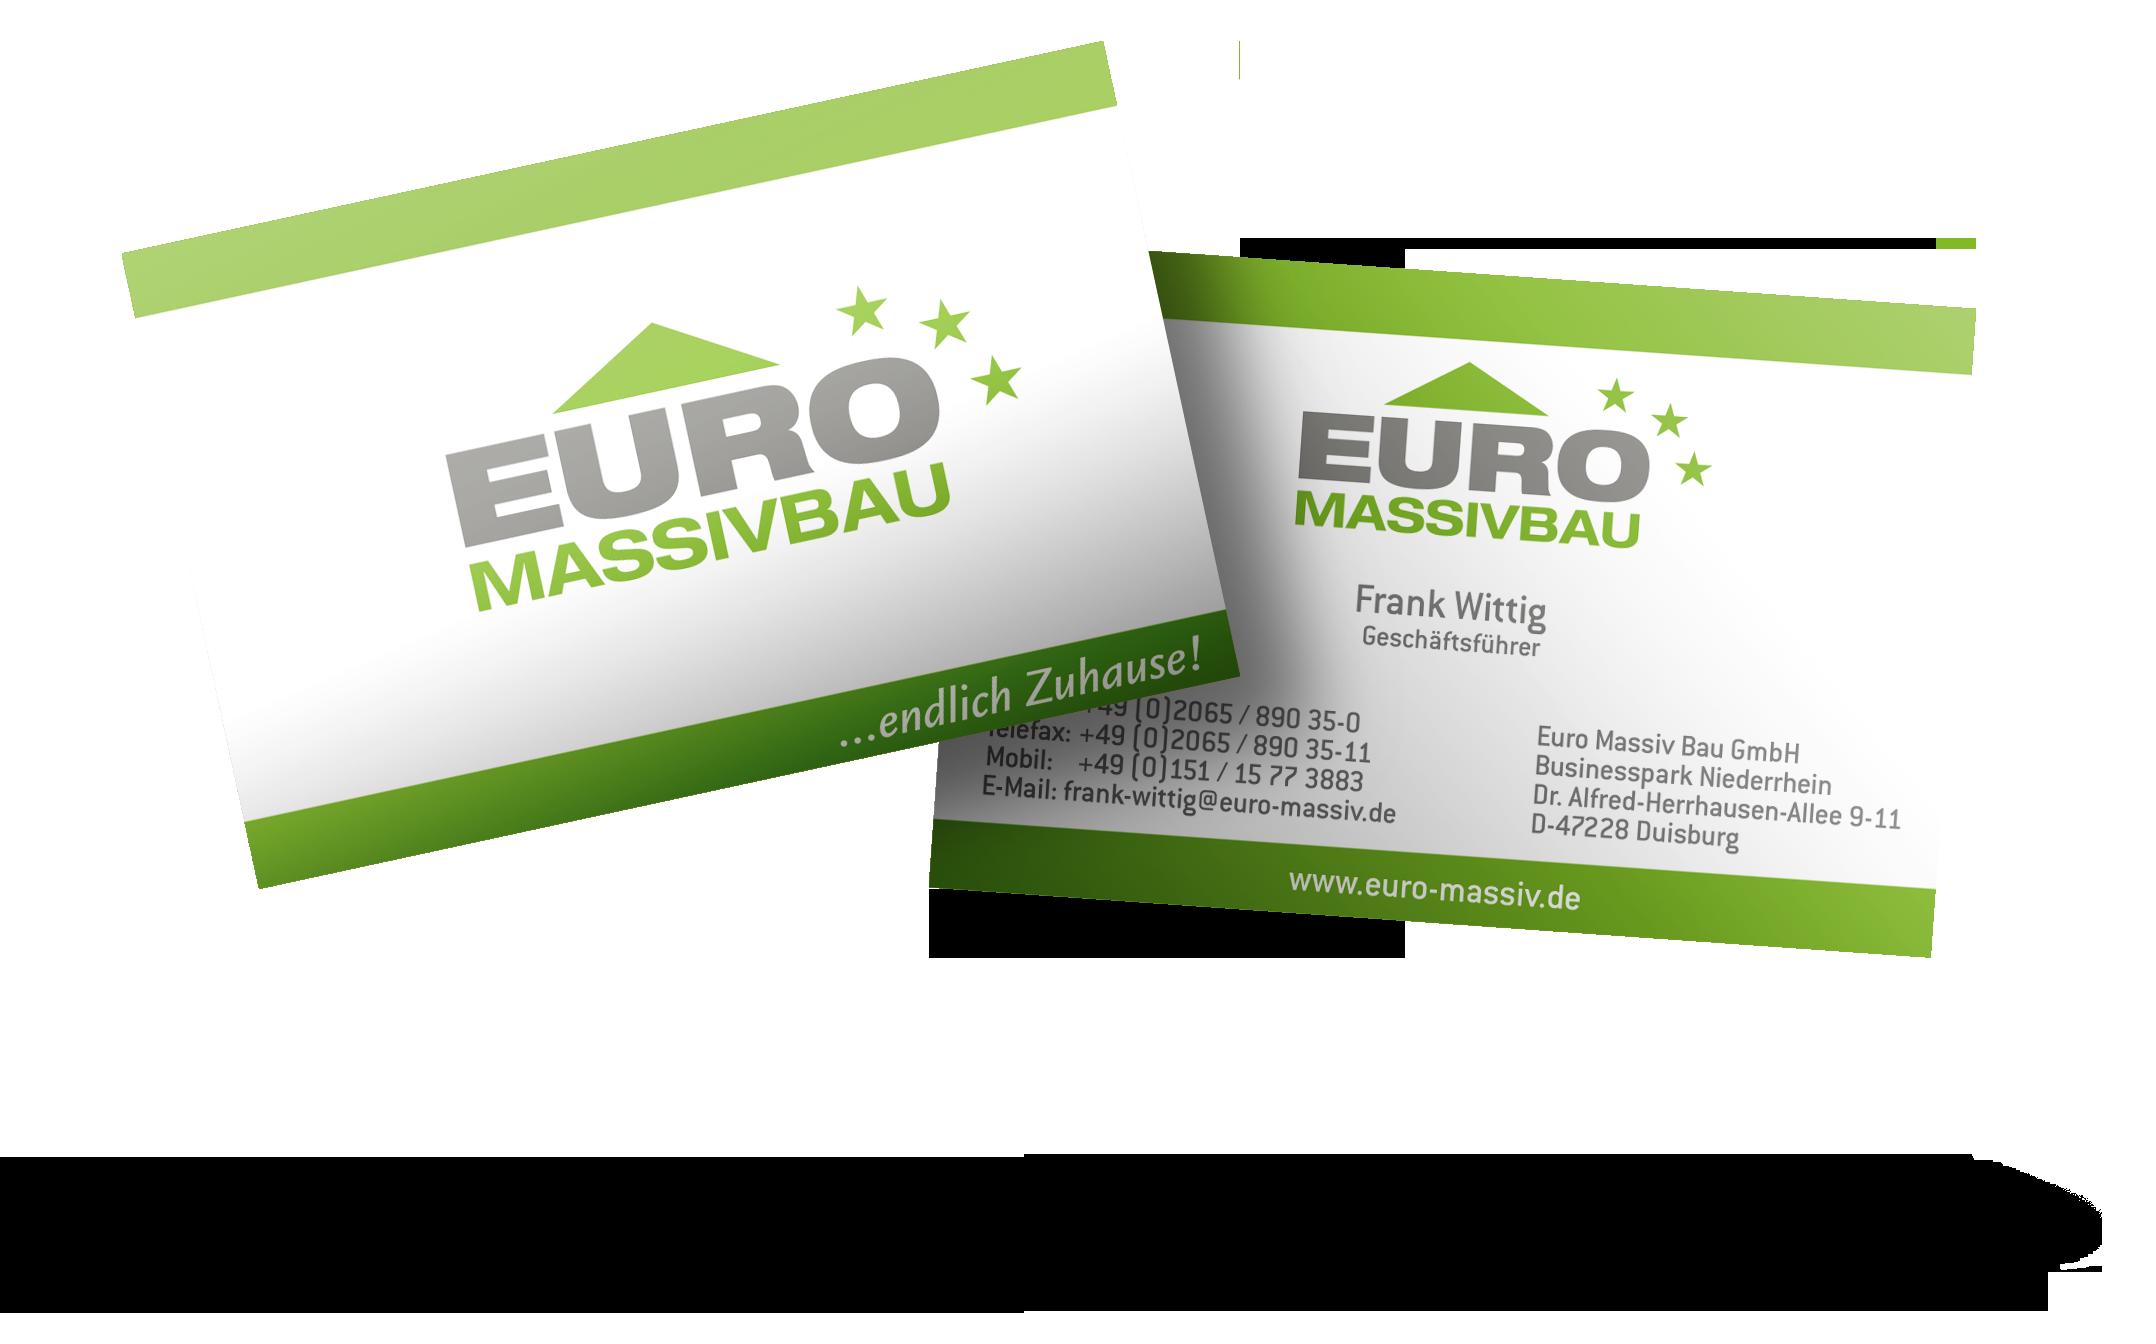 Werbeagentur Hendrich - Design & Fotografie - Euro Massiv Bau Visitenkarte